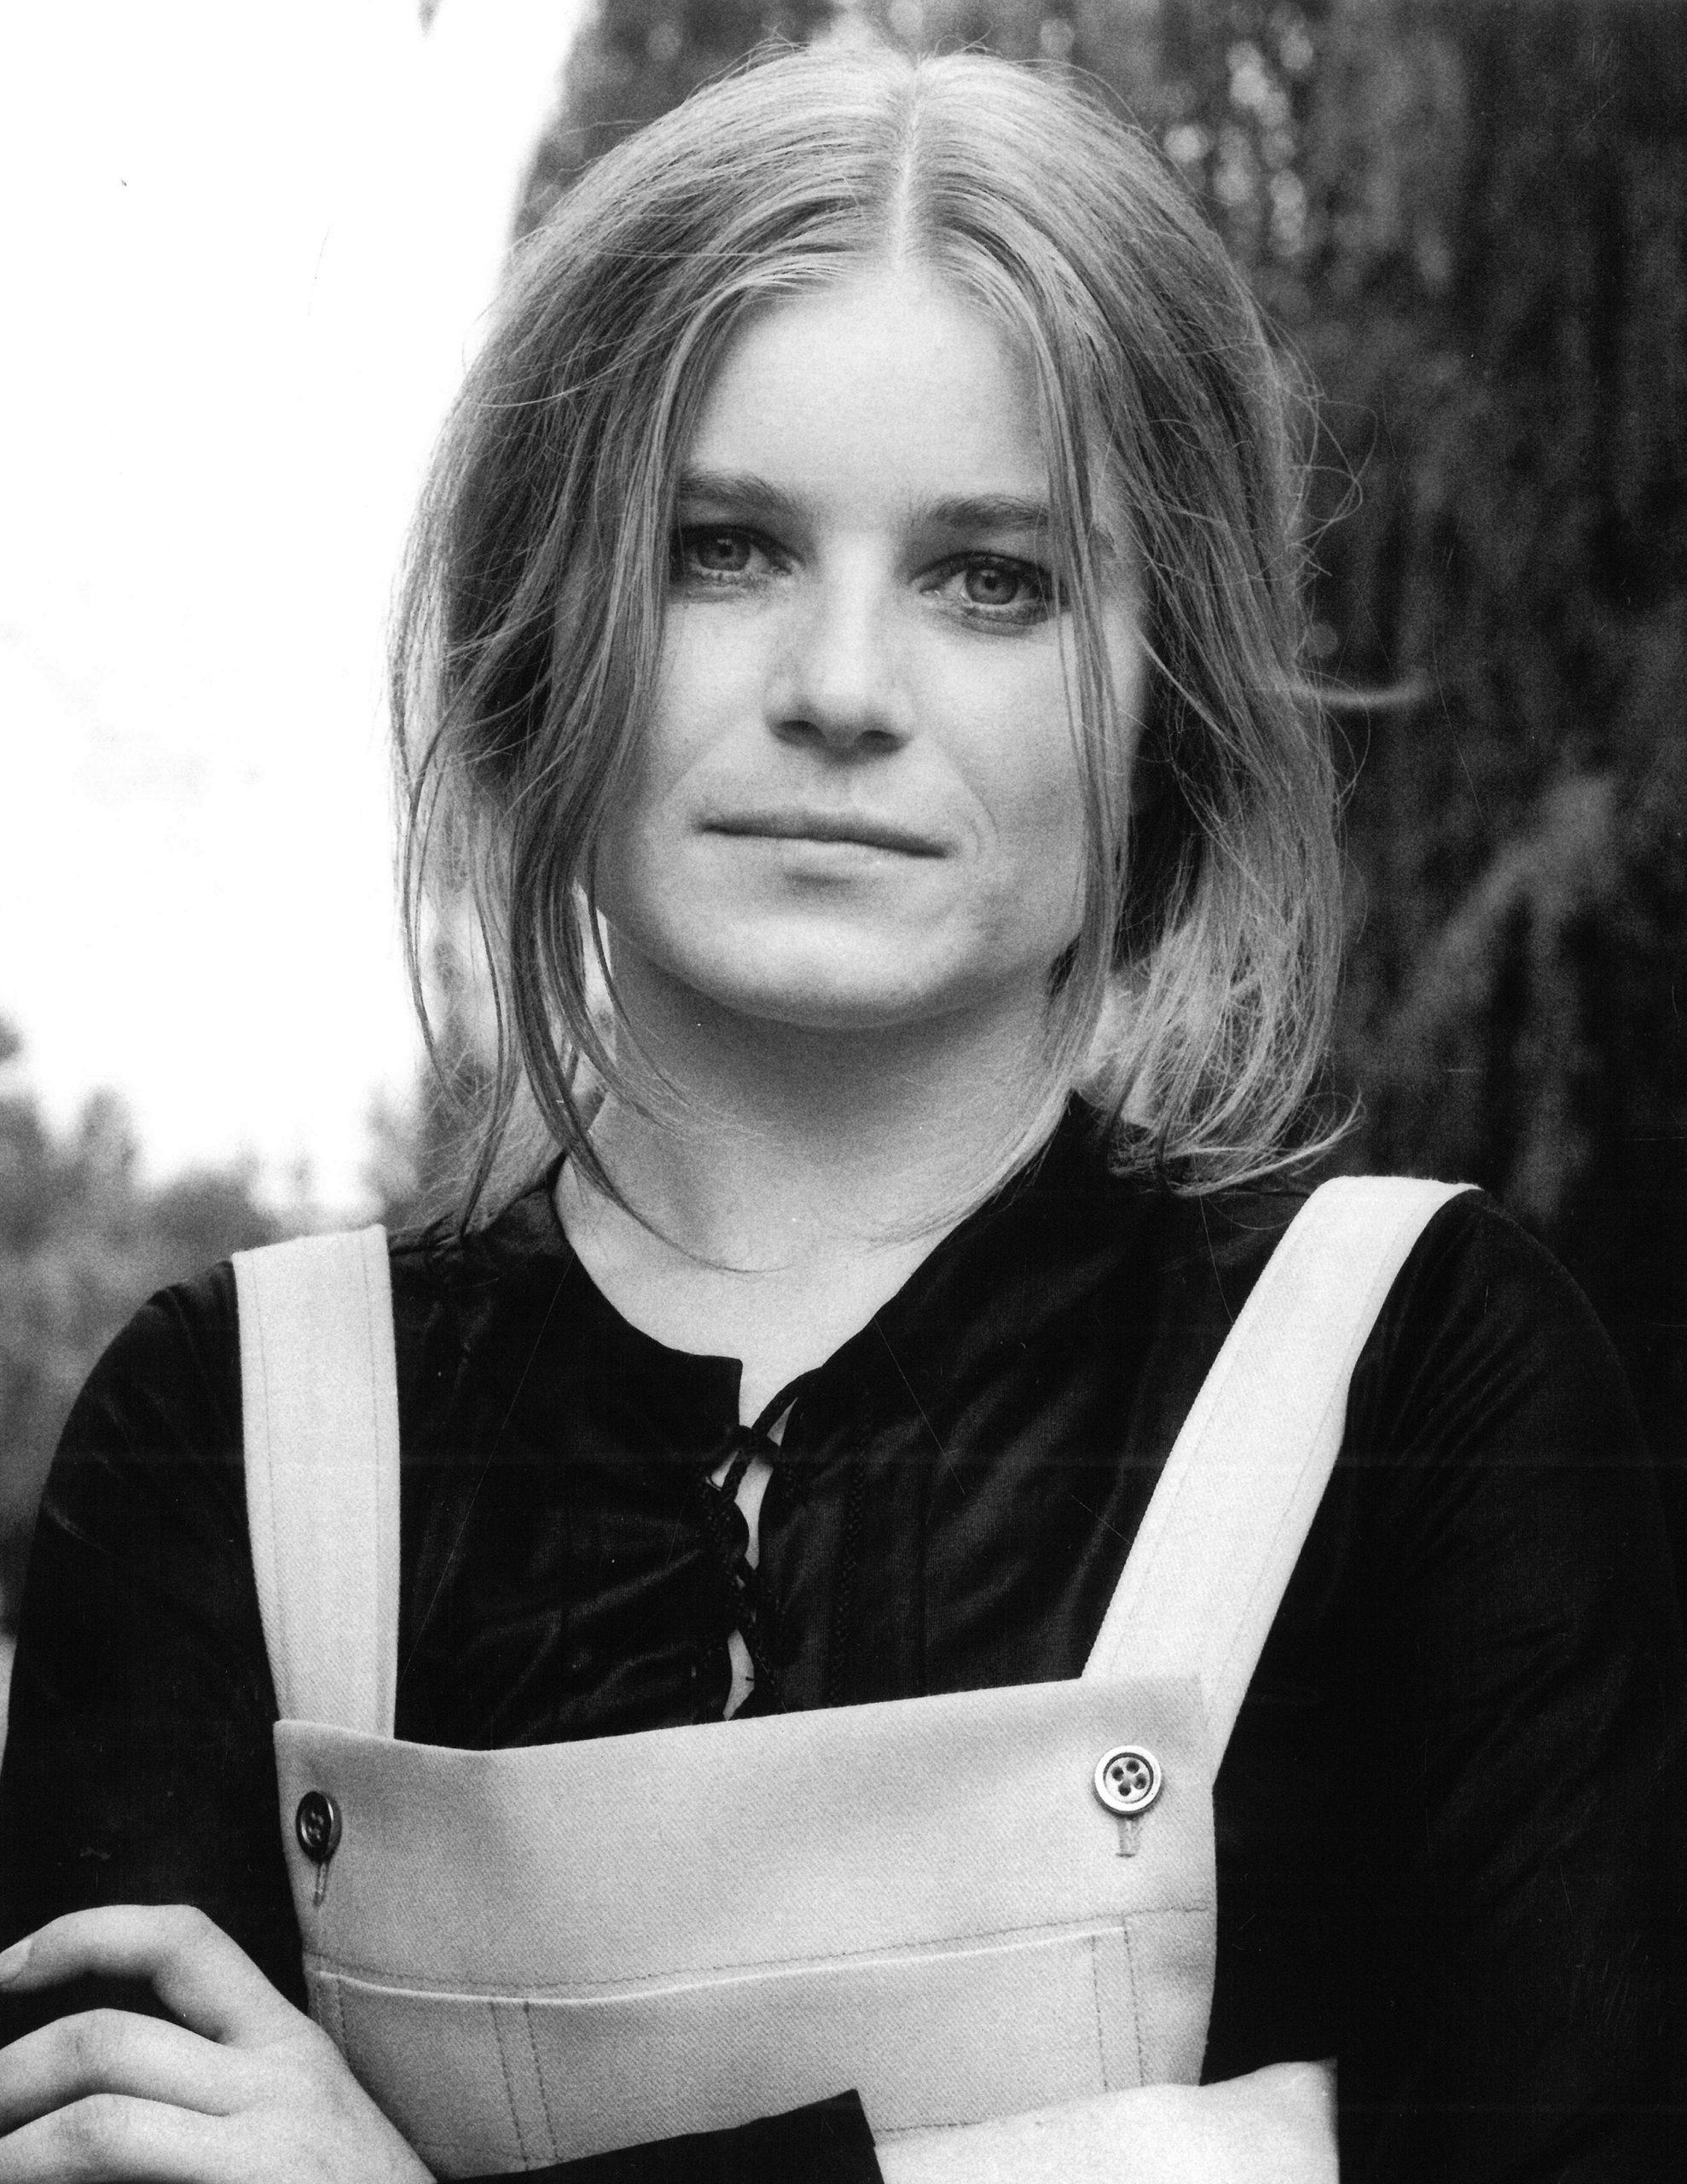 Renata Lewandowska - Fot. M.Karewicz